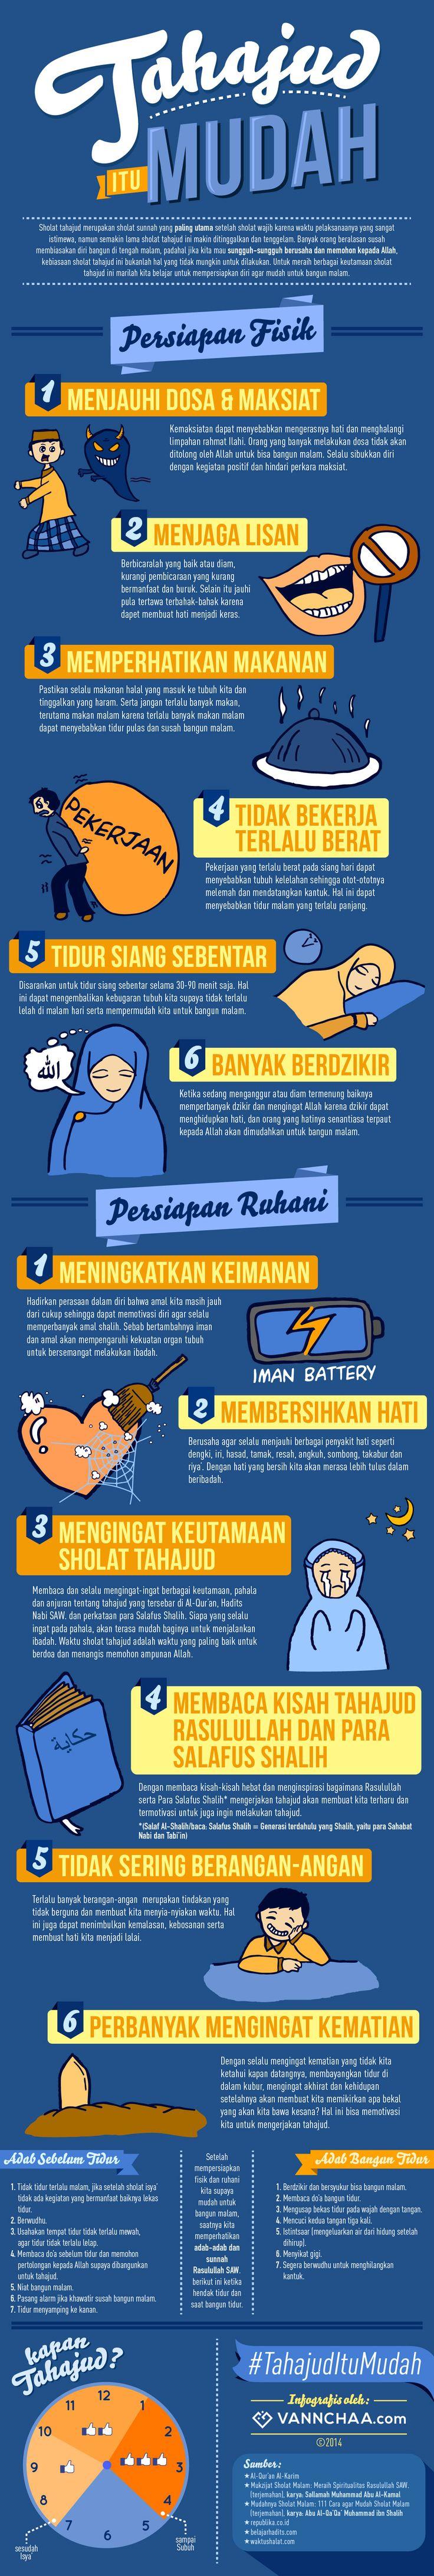 Infografis: Tahajud Itu Mudah #infographic #infografis #islam #moslem